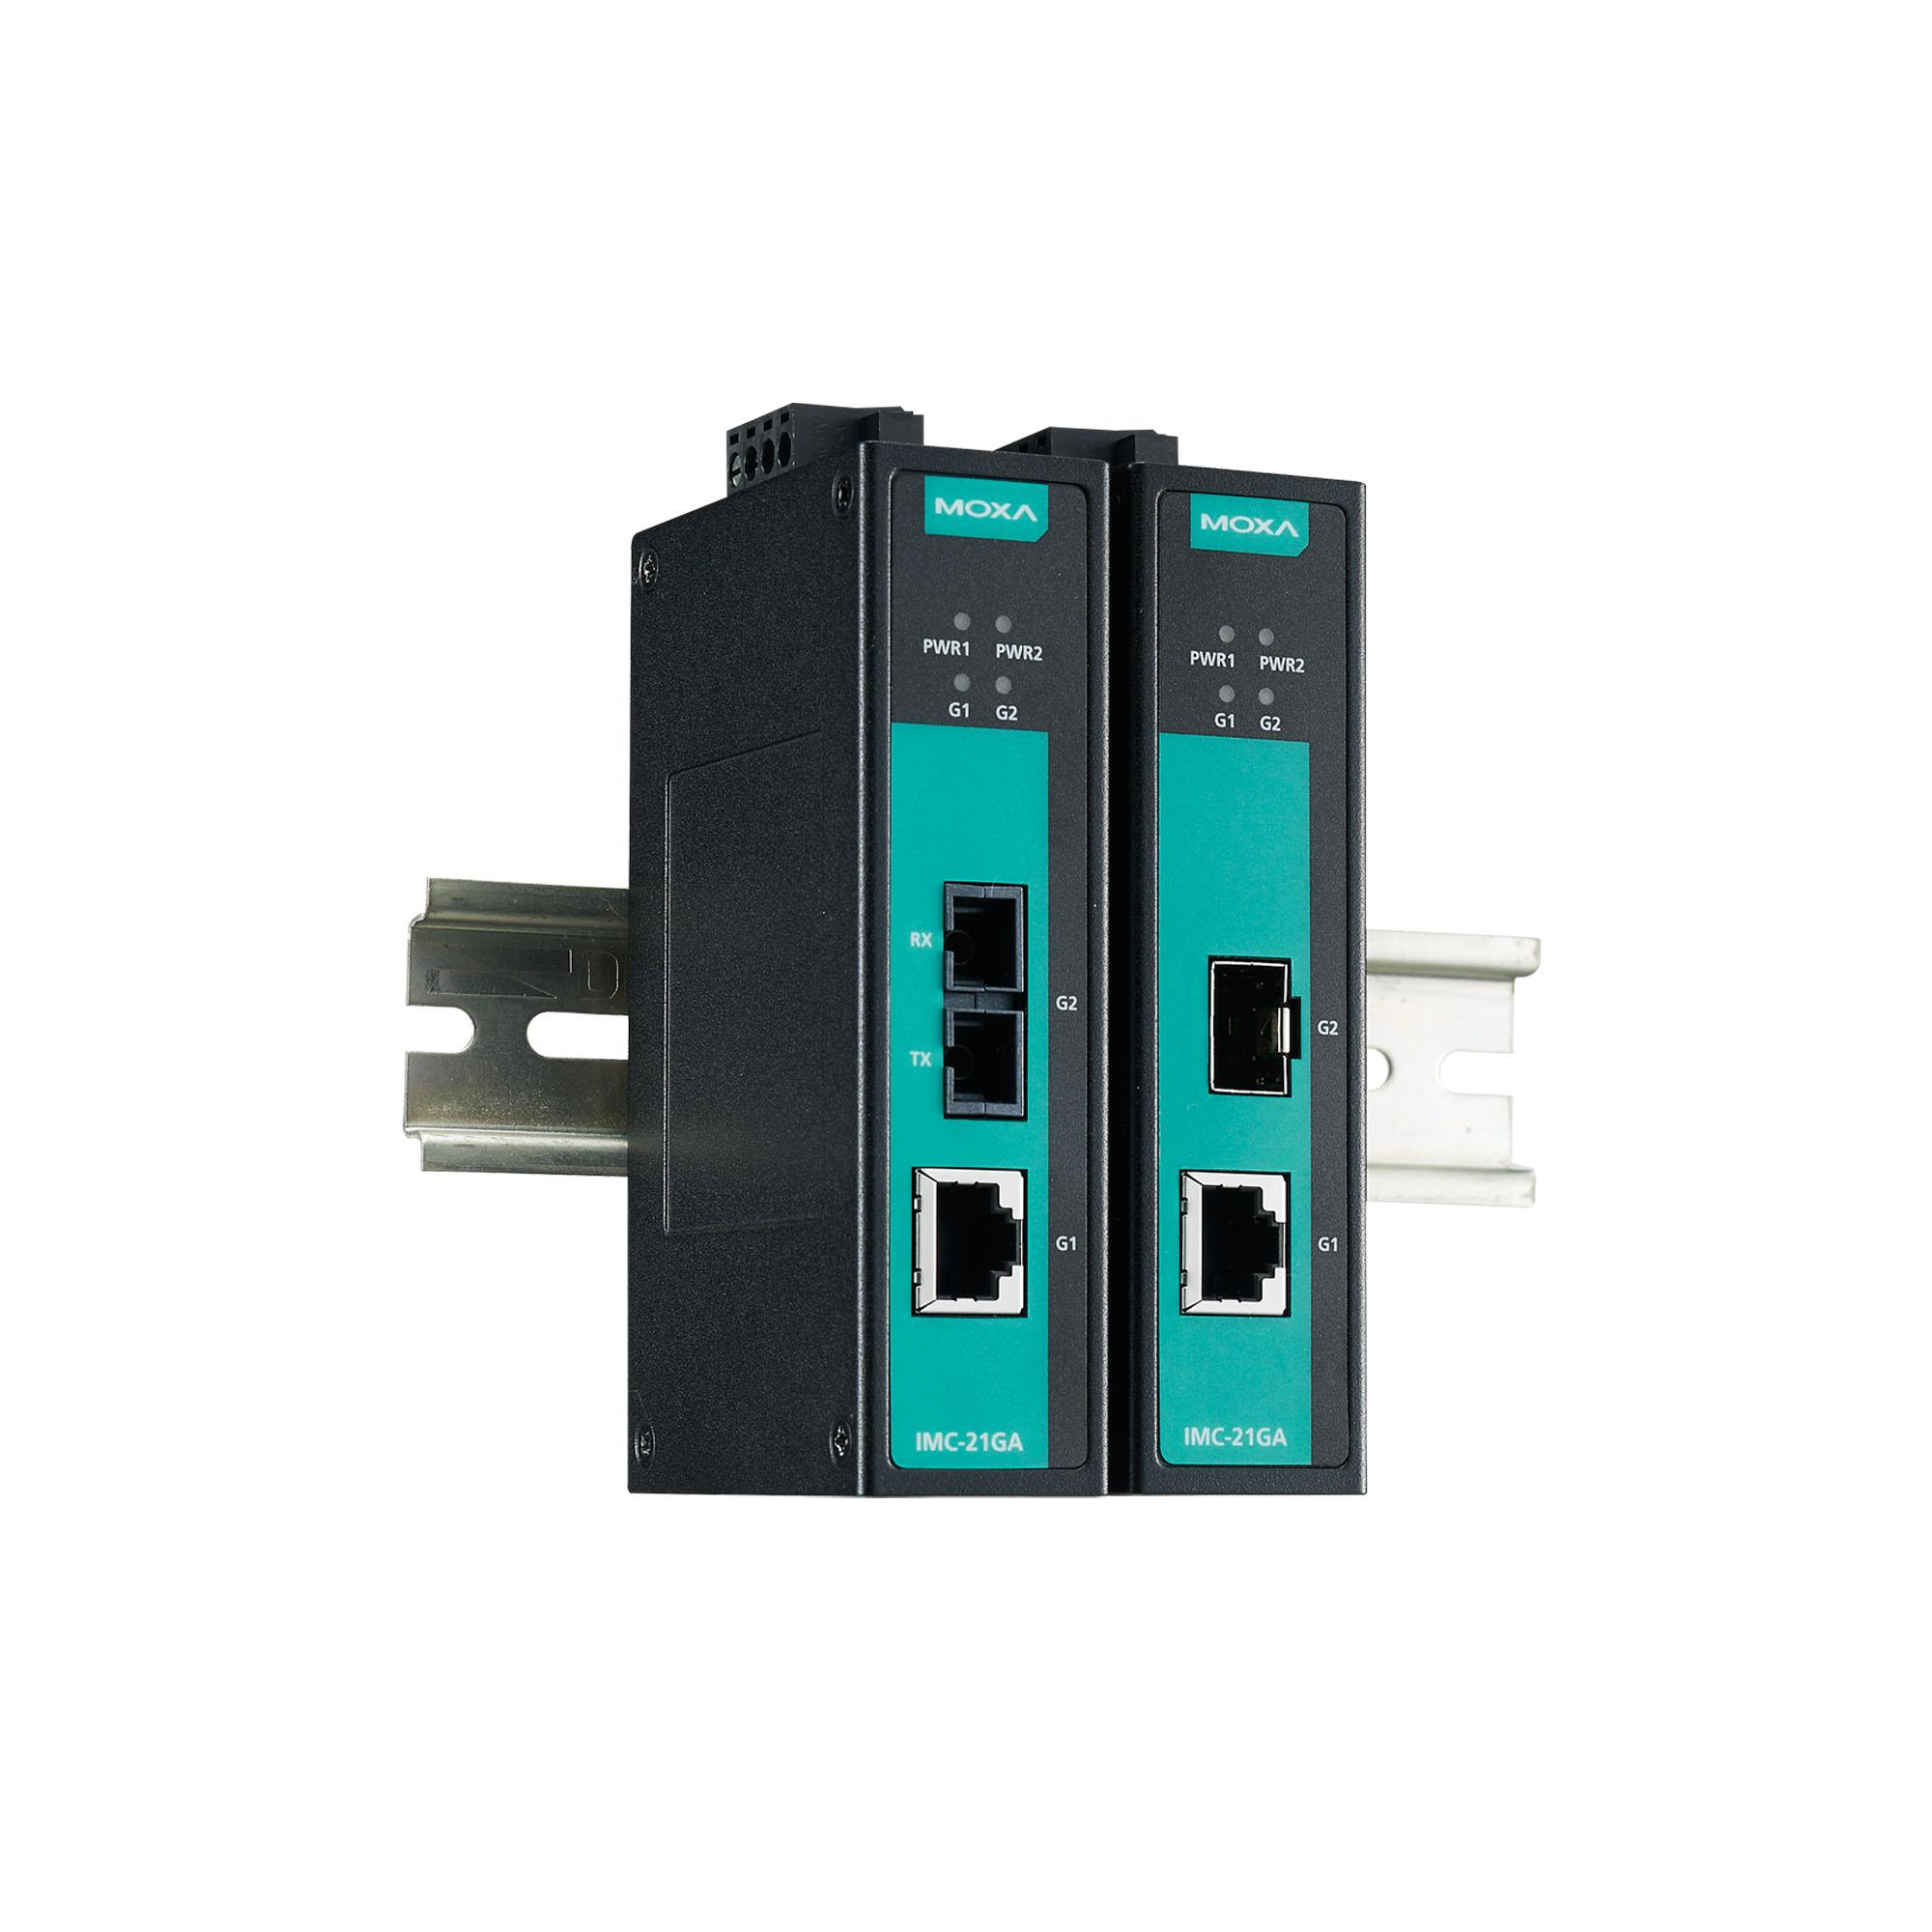 IMC-21GA Series - Ethernet-to-Fiber Media Converters   MOXA